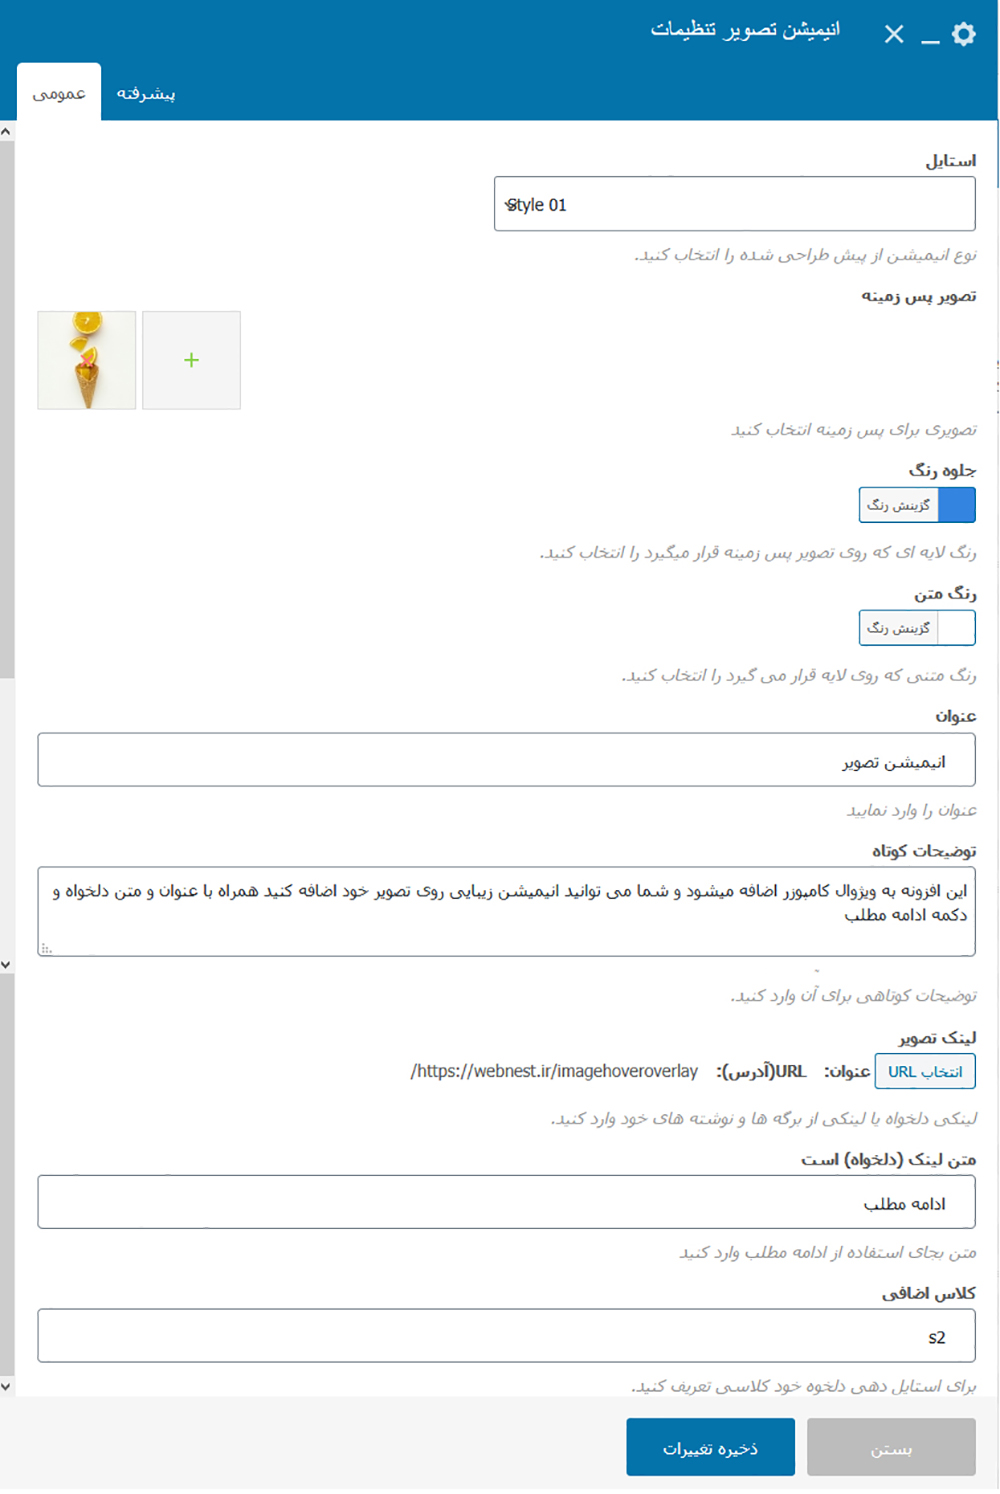 39491 0972b56004c3ae51e7631c173 1 - افزونه Image Hover Overlay | افزونه انیمیشن تصویر برای ویژوال کامپوزر